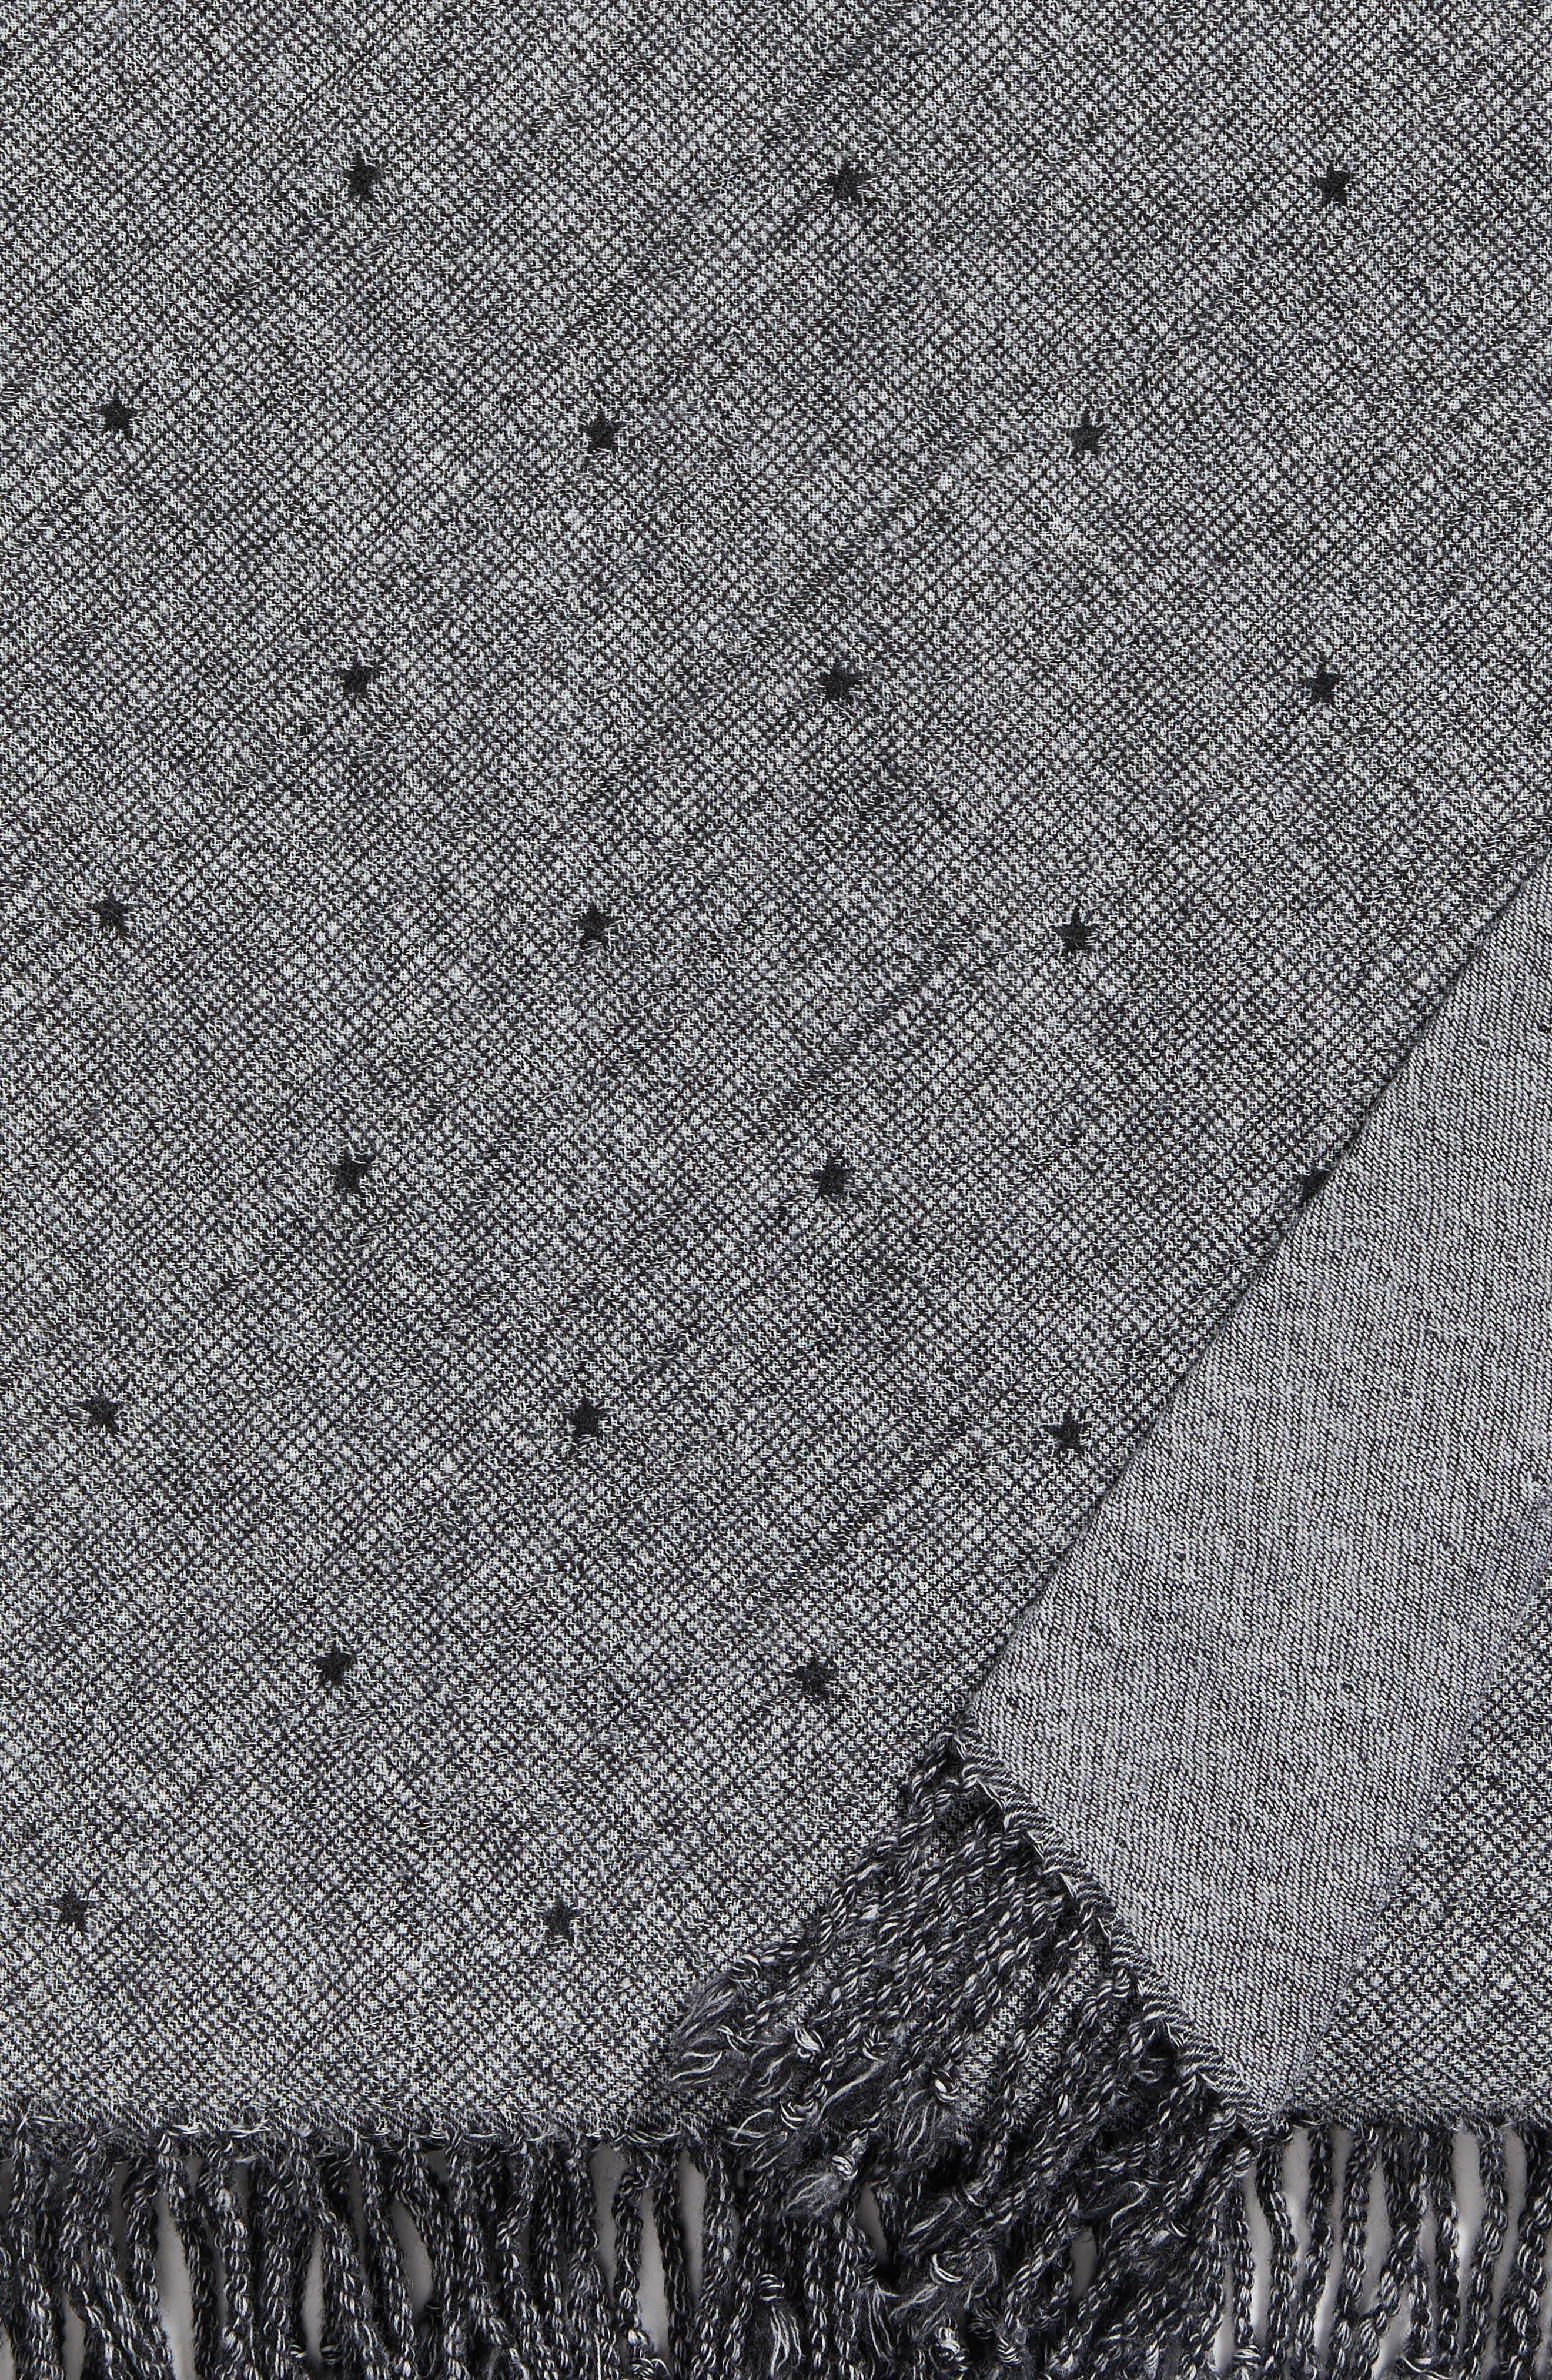 Blackstar Double Face Merino Wool Throw,                             Alternate thumbnail 2, color,                             BLACKSTAR